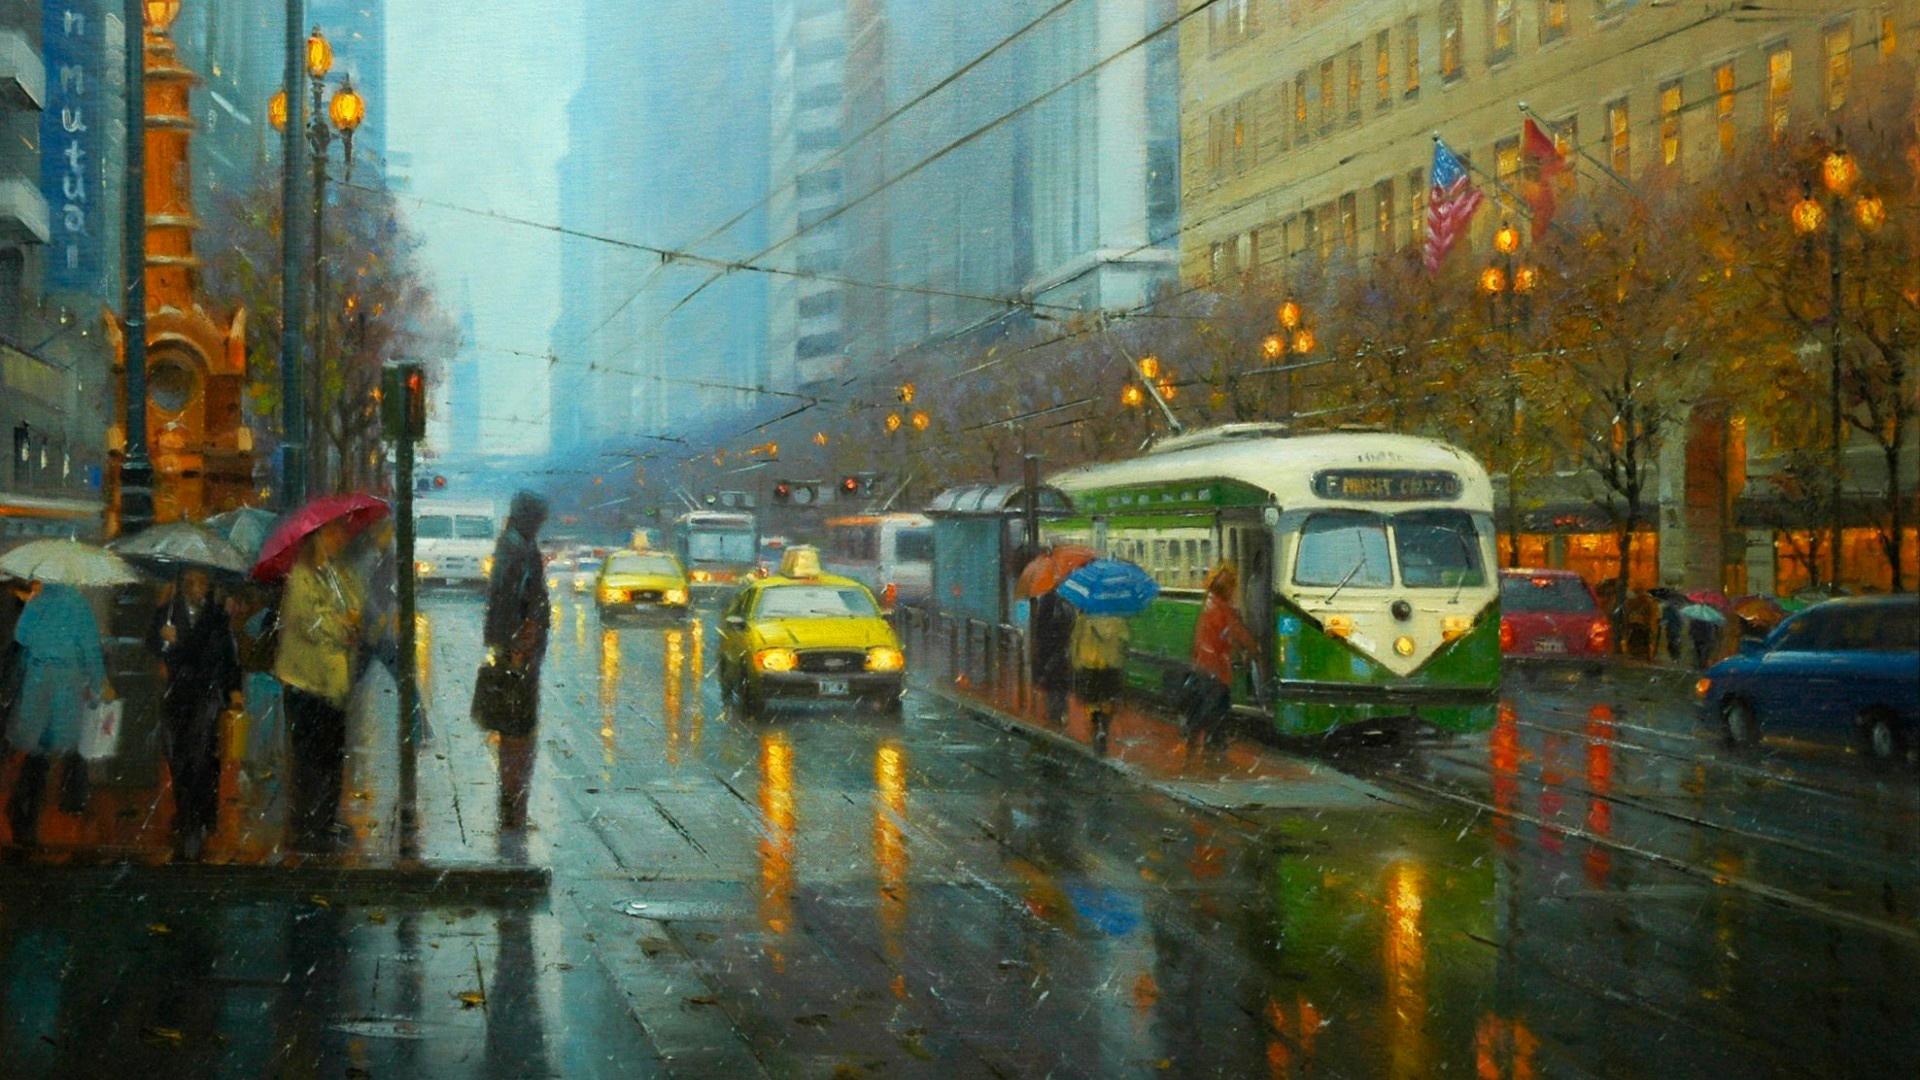 rain-city-wallpaper-hd-resolution-For-Desktop-Wallpaper